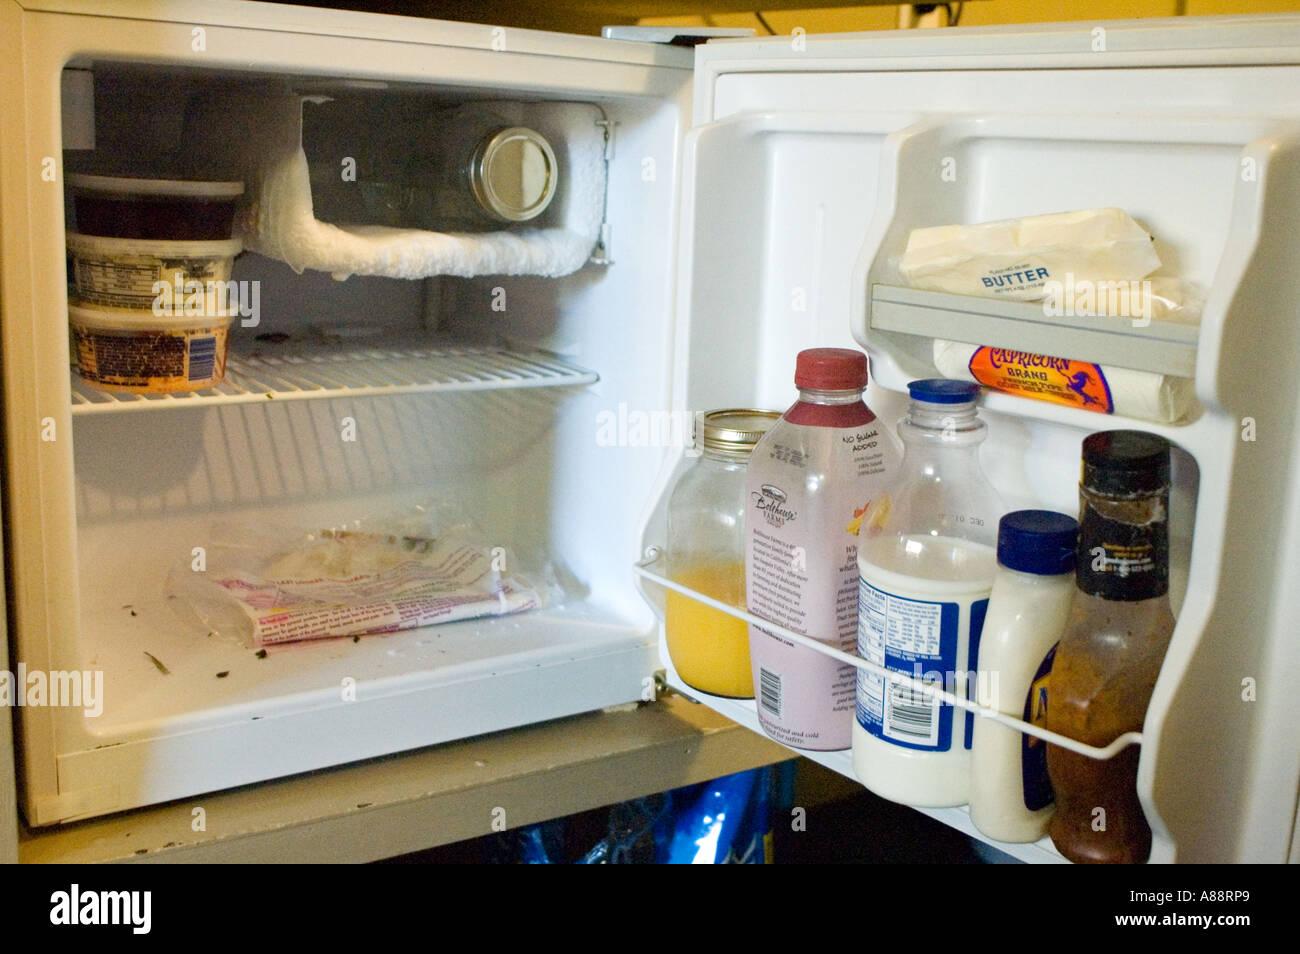 My Fridge Mini Kühlschrank : Diy fridge der kühlschrank im eigenbau youtube